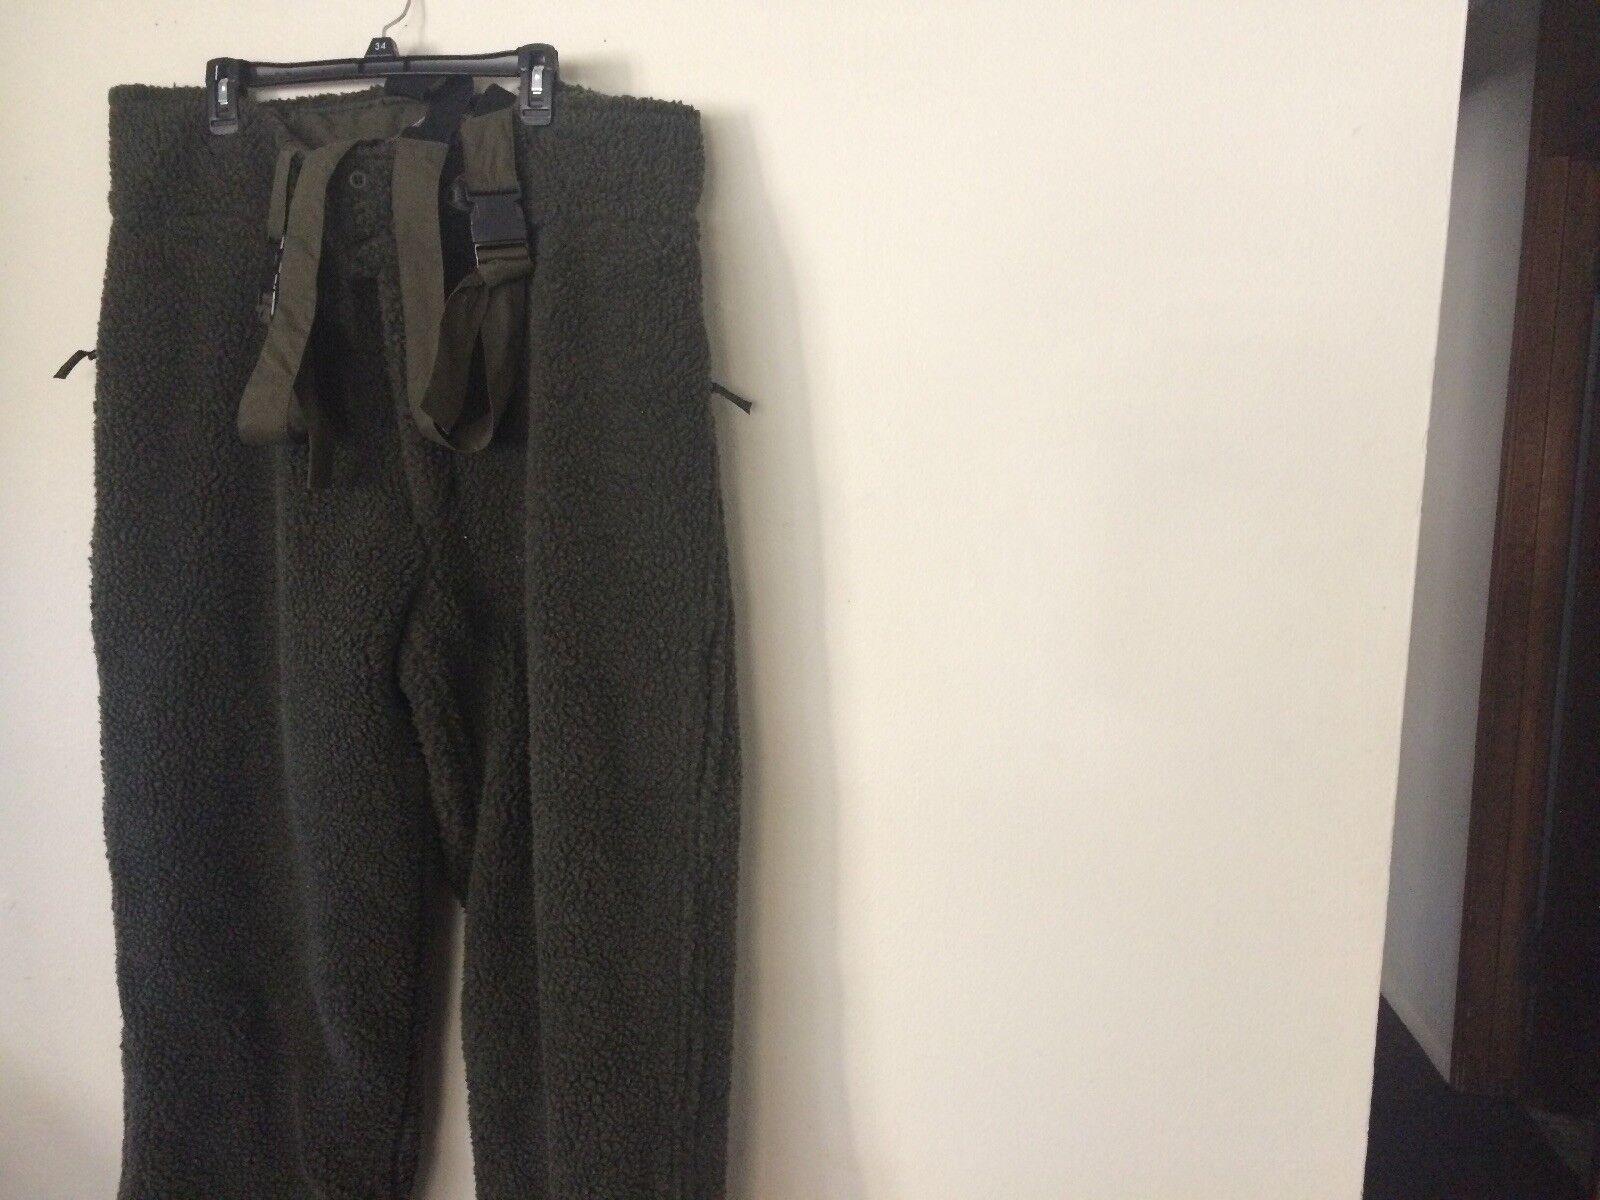 Akah Shooter King Hunting Bib Pants Fleece Made In Germany XL